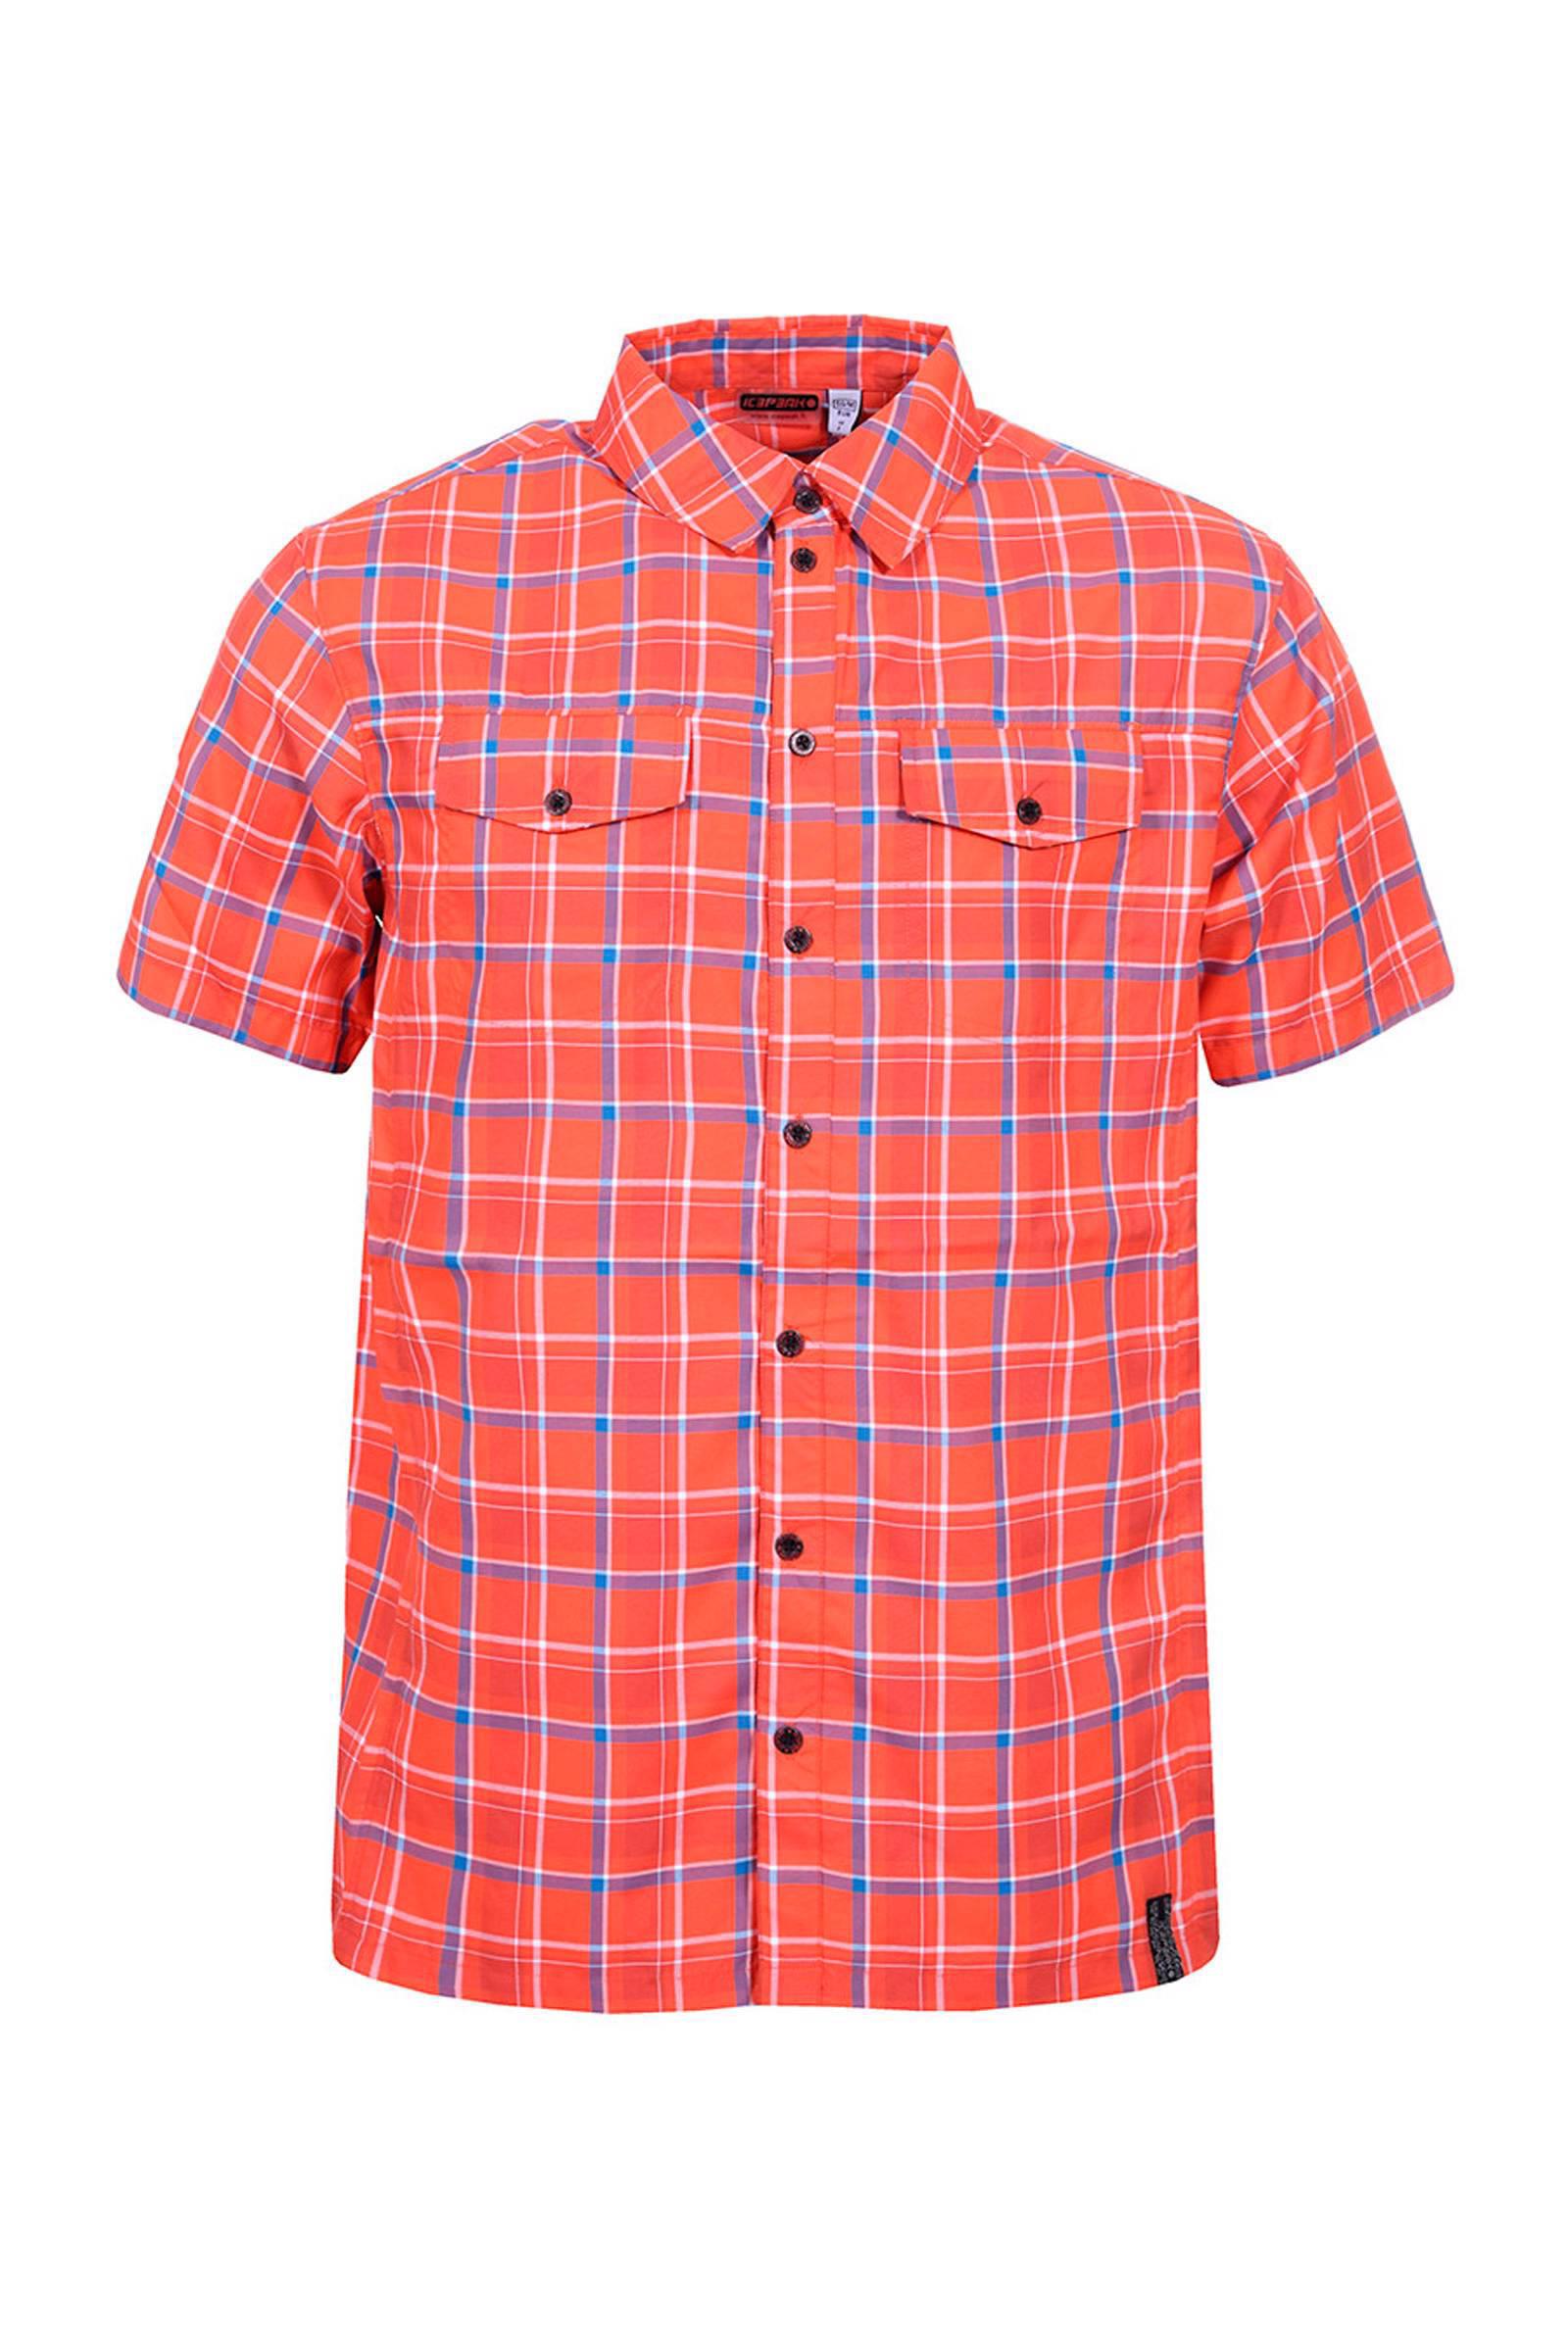 overhemd outdoor oranje Saul geruit Icepeak SZq7U